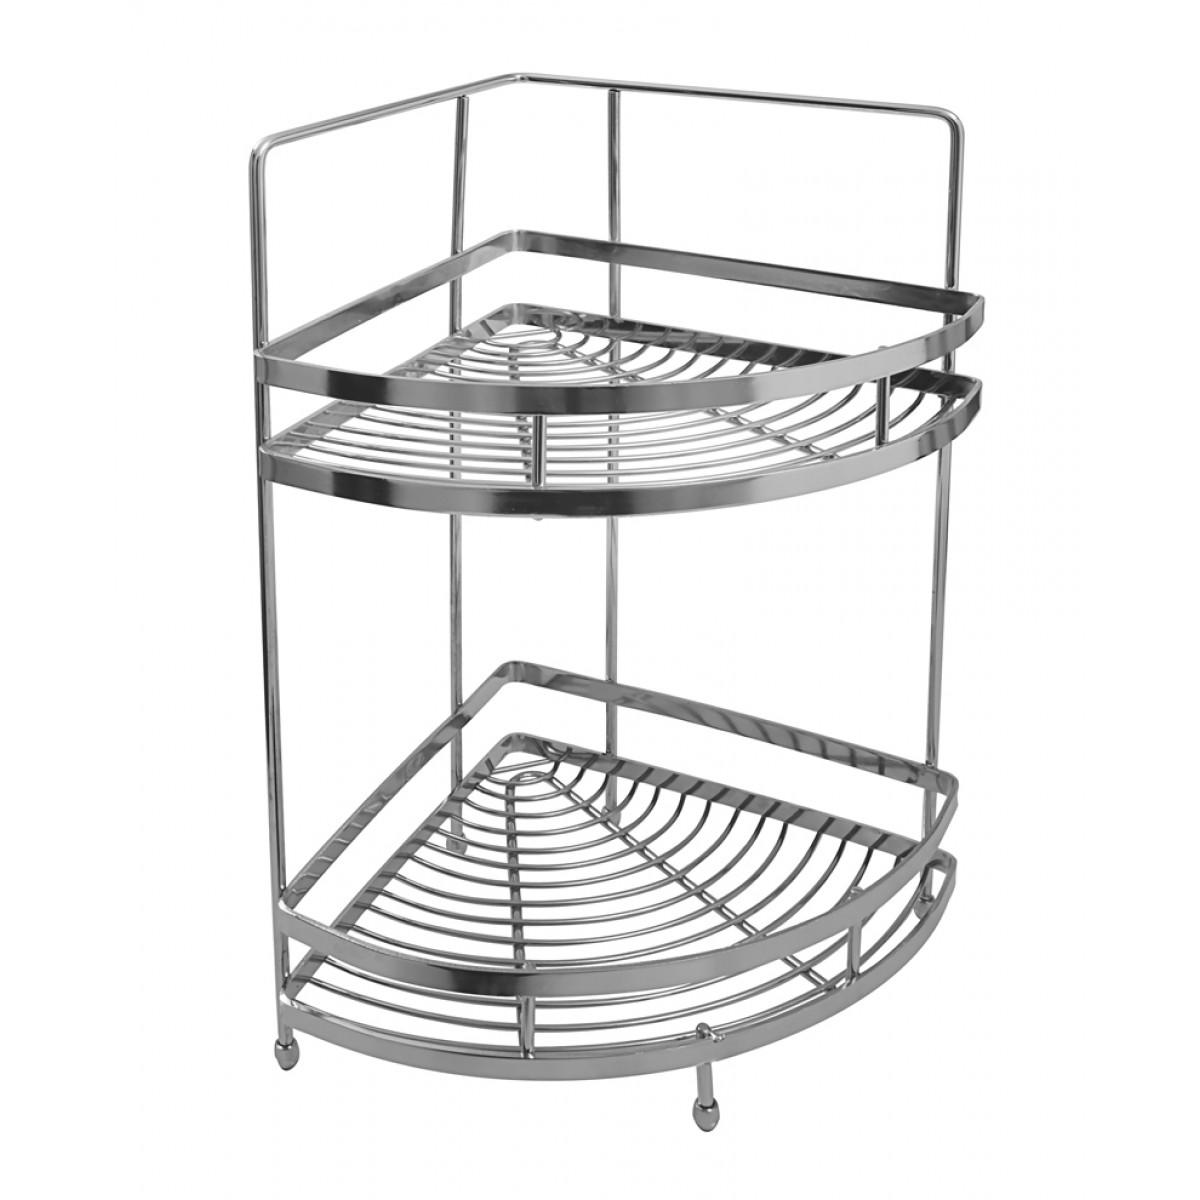 kitchen basket modern chairs klaxon stainless steel double shelf silver accessories solutions